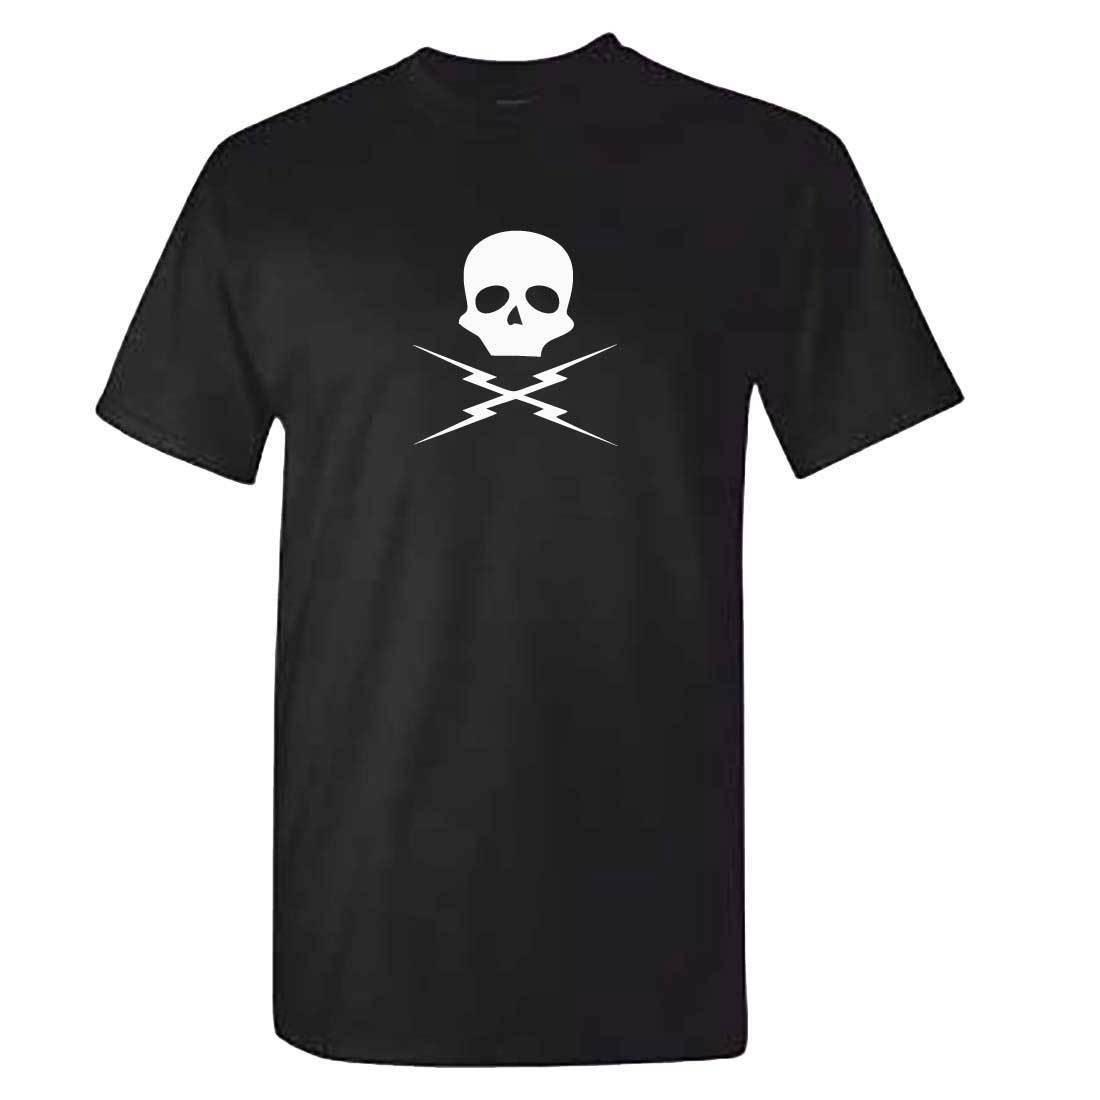 death-proof-tshirt-mens-quentin-font-b-tarantino-b-font-grind-house-stunt-man-dvd-cult-movie